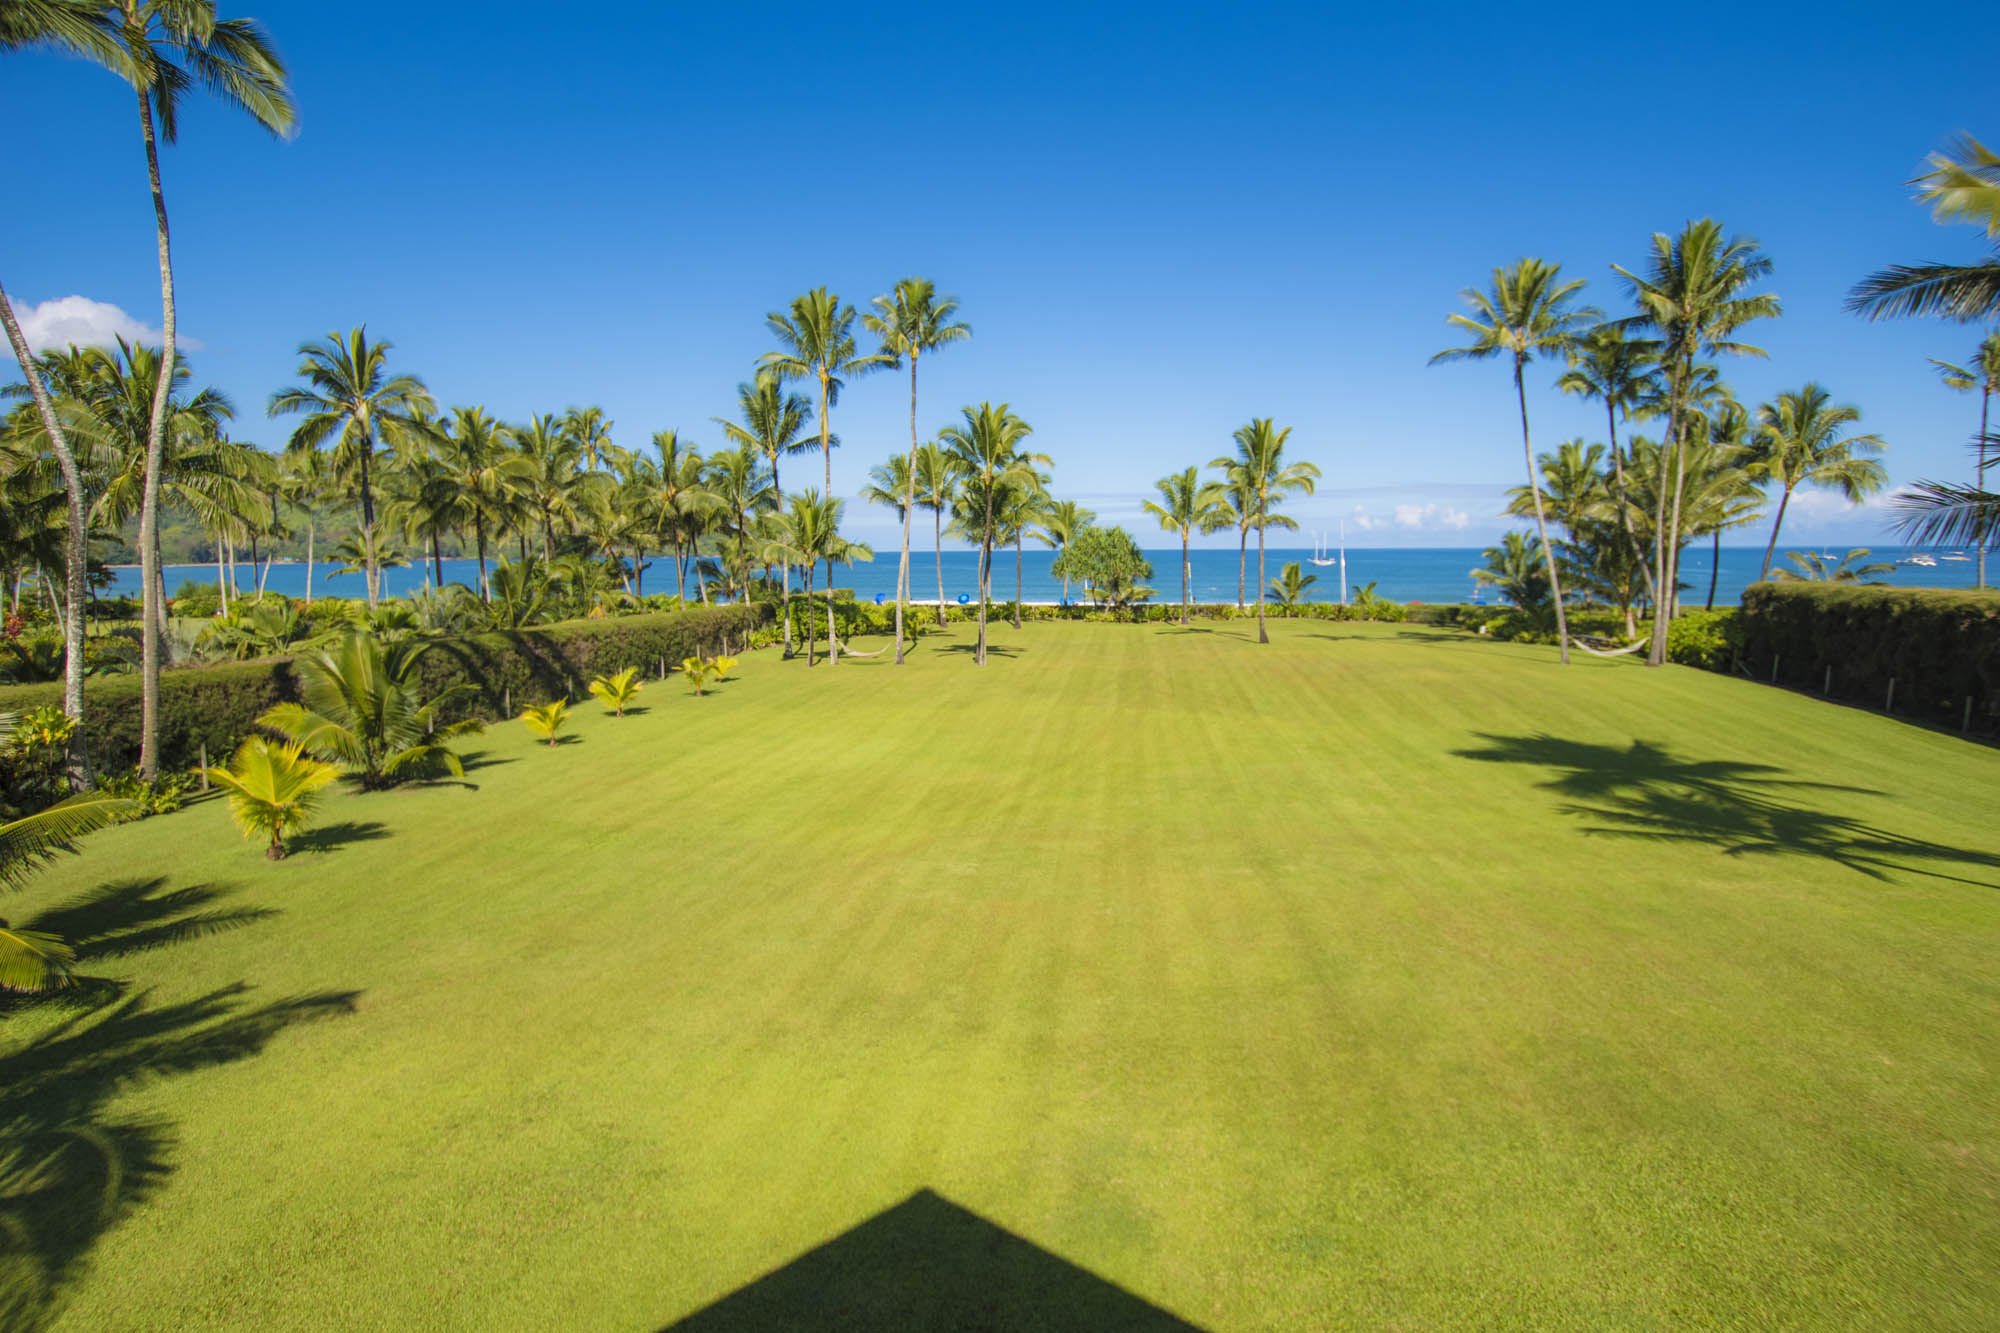 Kauai-217-Hanalei Bay44